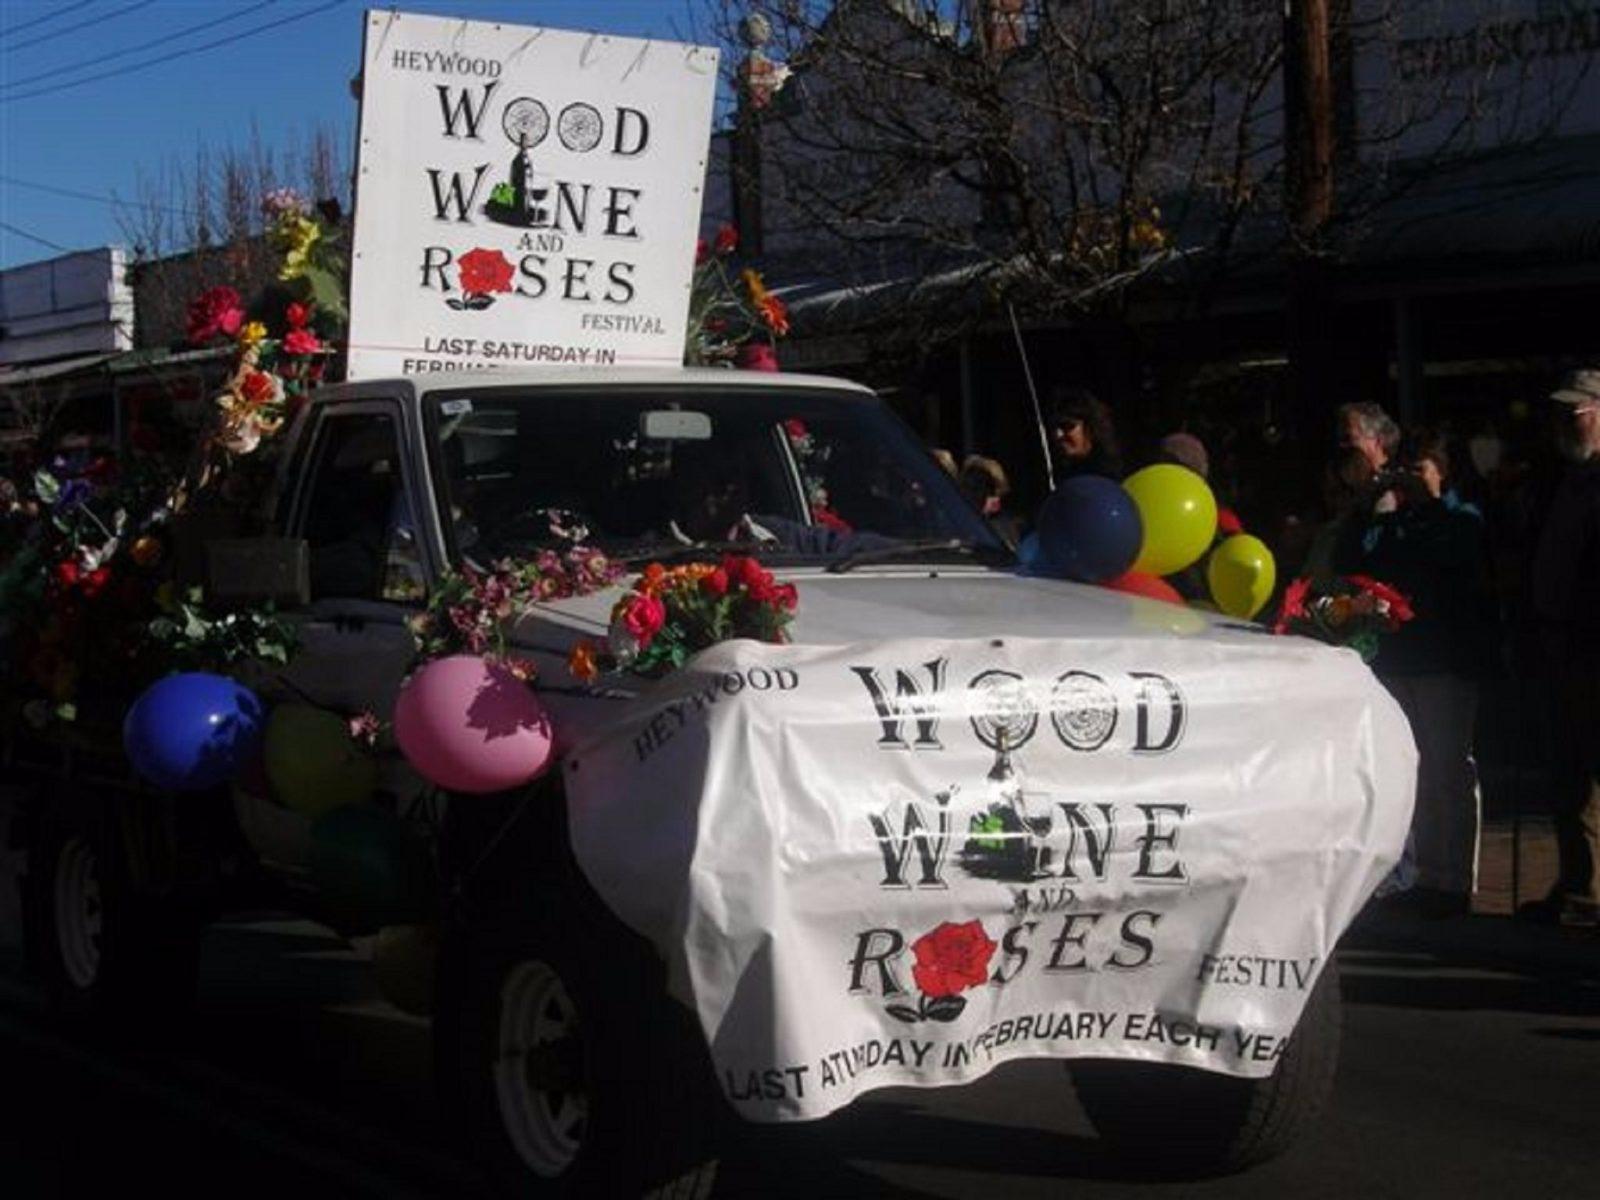 Wood Wine Roses Festival